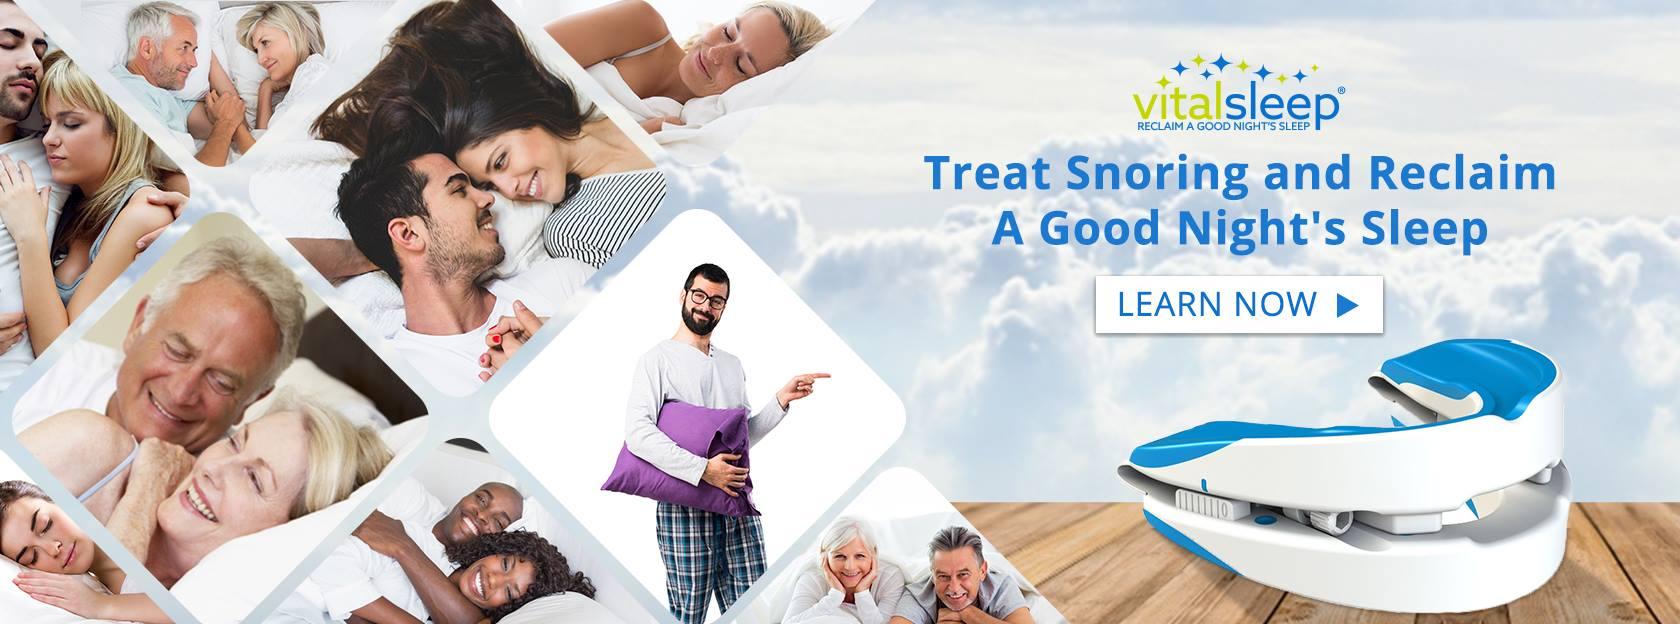 About Vital Sleep Homepage